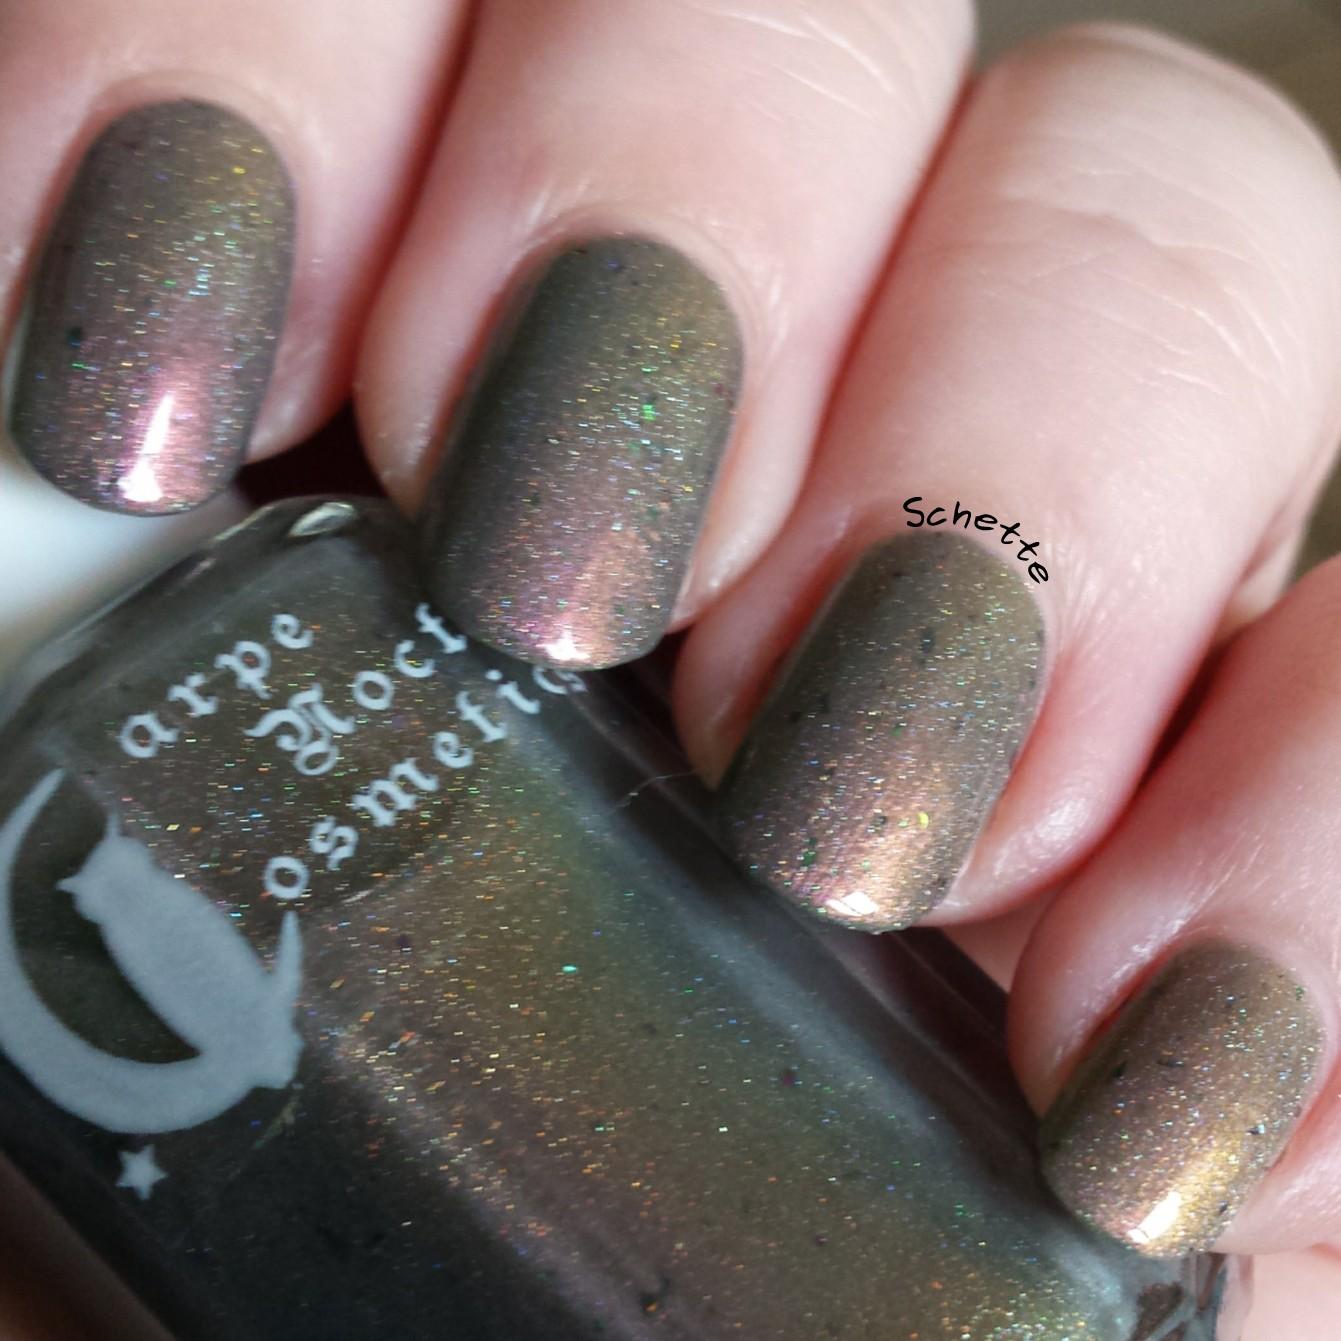 Carpe Noctem Cosmetics - Beyond the clouds